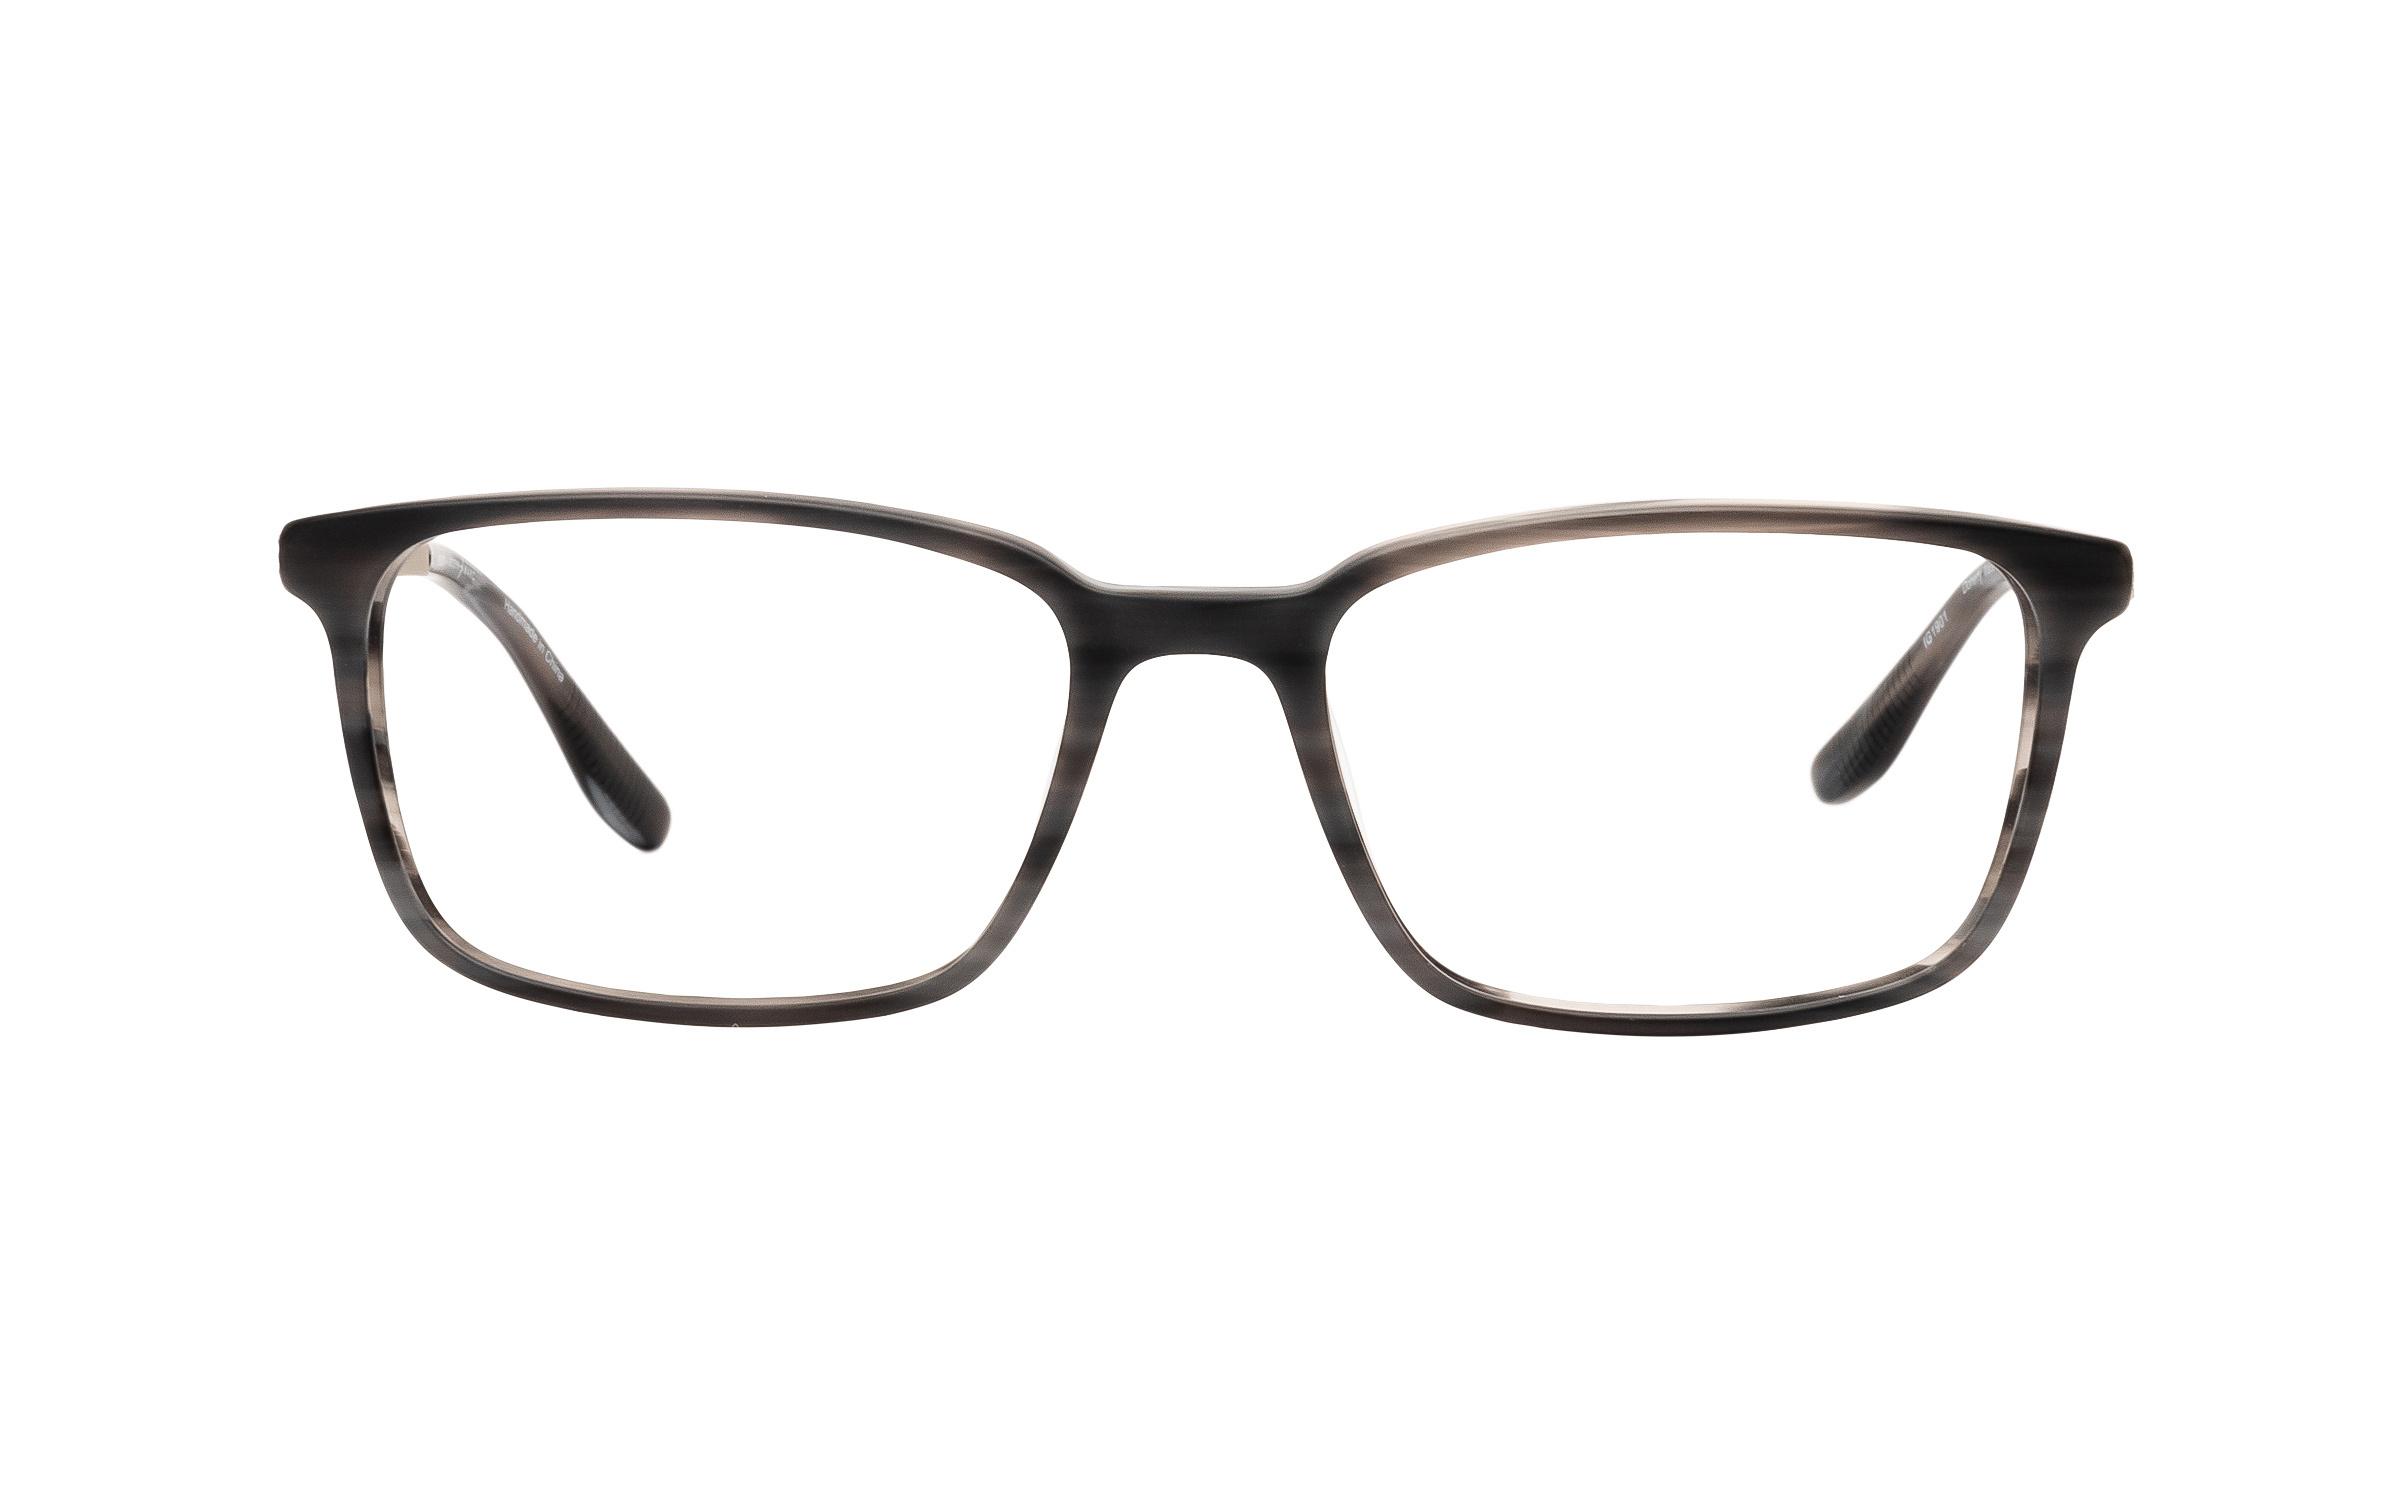 Joseph Marc Men's Doherty (53) Eyeglasses and Frame in Matte Grey Horn | Acetate/Metal